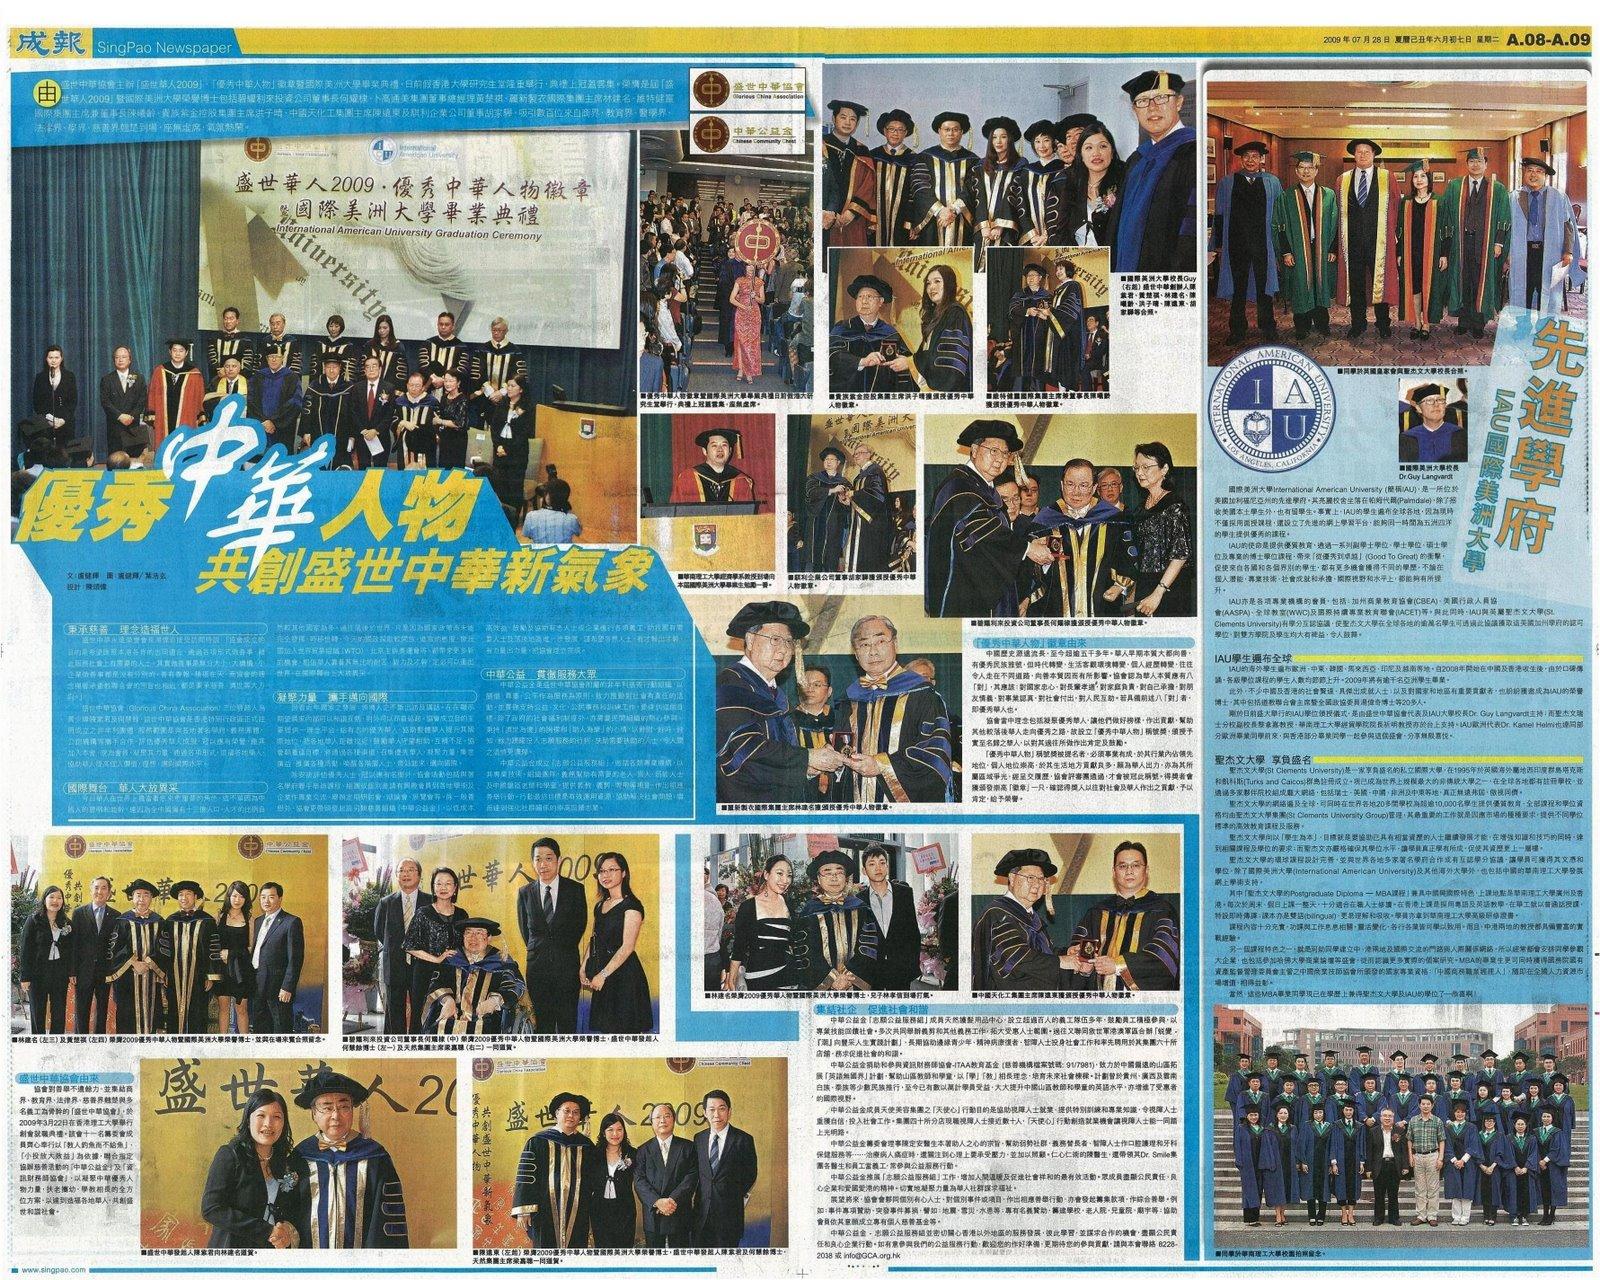 IAU畢業典禮新聞-成報2009-07-28